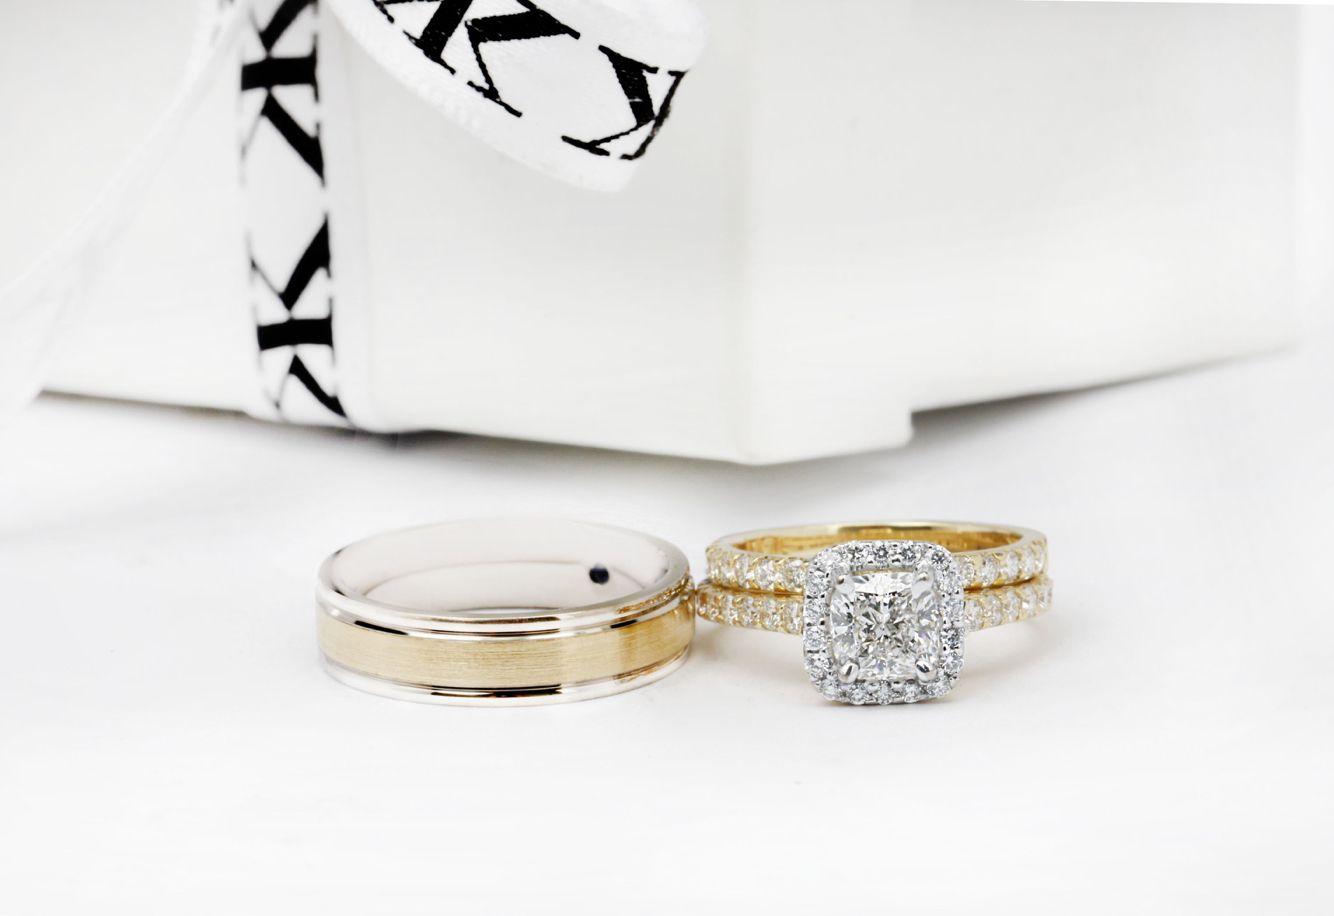 #diamondhaloengagementrings#diamondrings#diamondweddingbands#gentsring#custommaderings#jewellersmelbourne#cityjeweller#cbdjewellers#artdeco www.kalfin.com.au